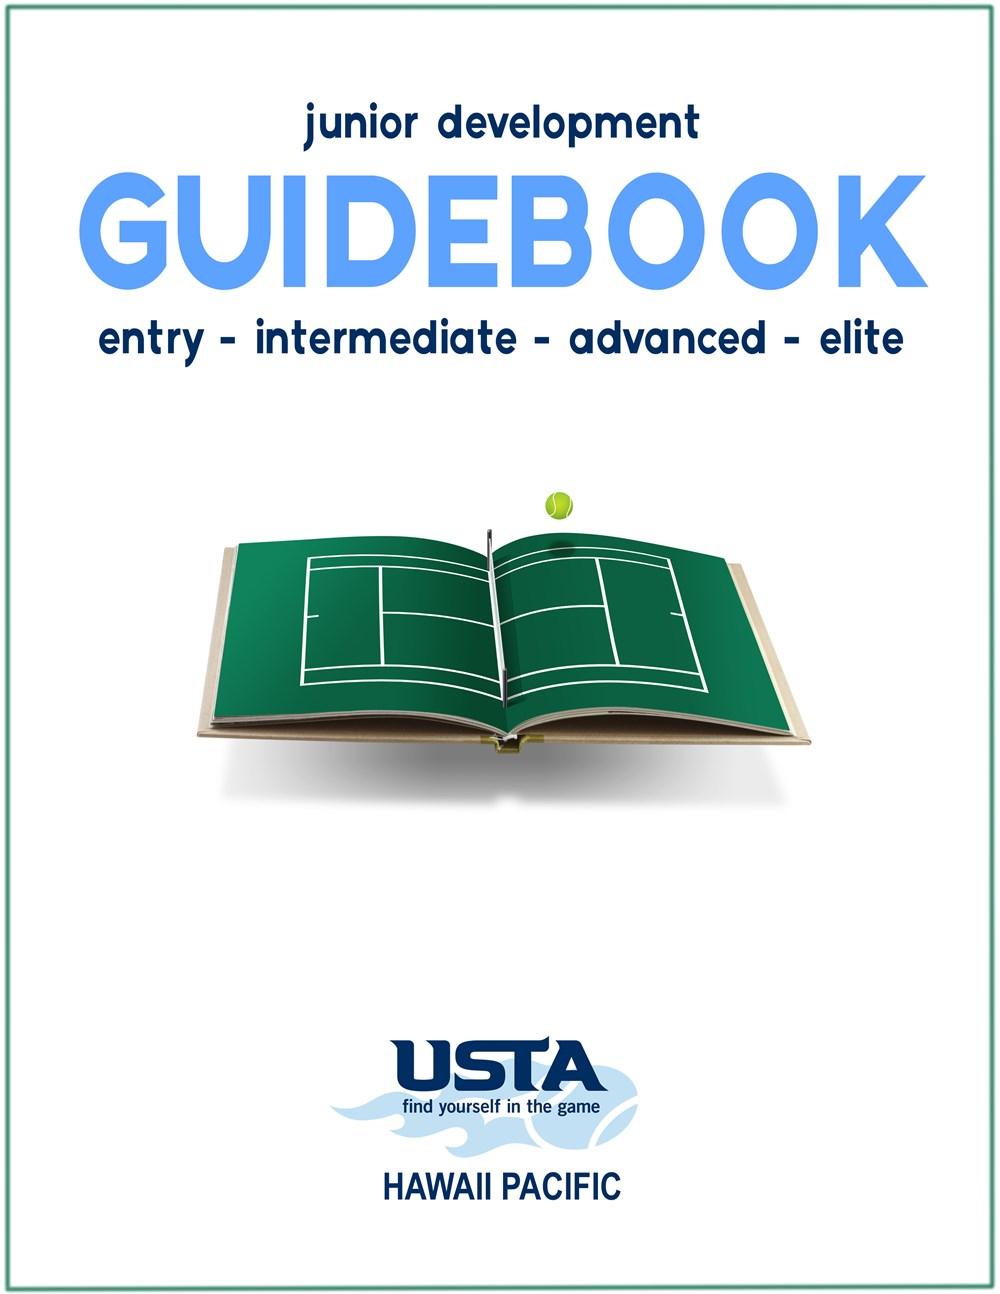 1_-_Guidebook_cover_(psd_format)